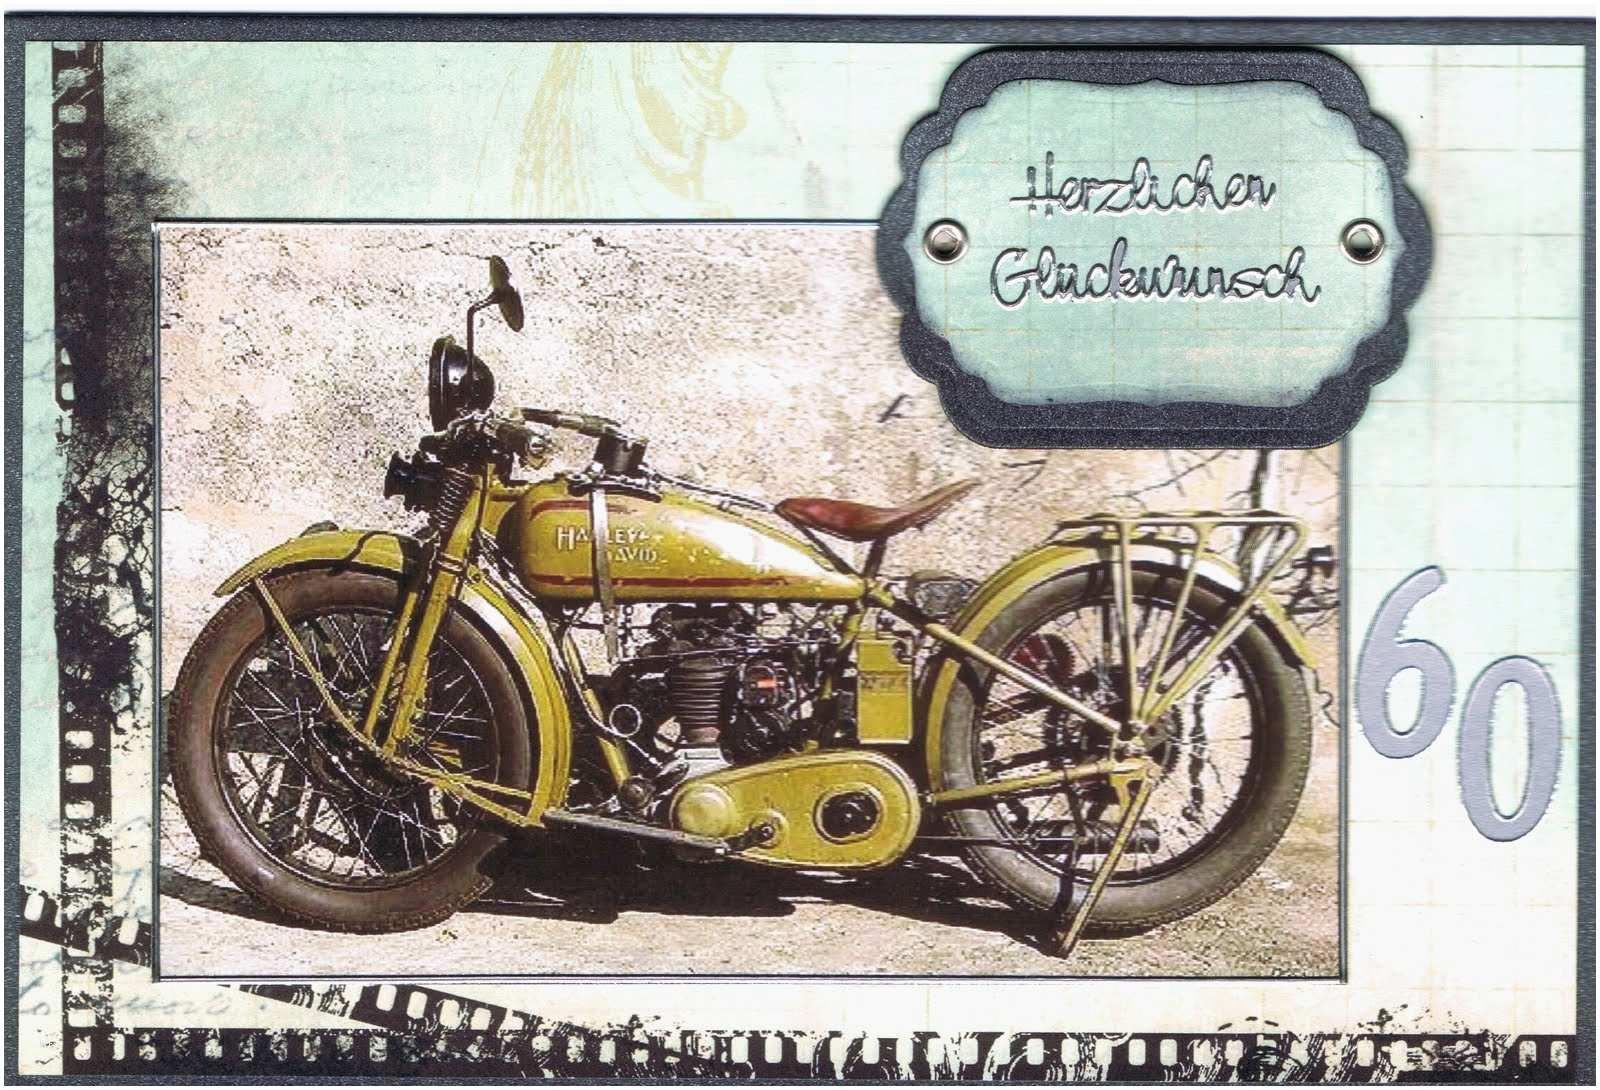 Motorrad Geburtstagsbilder  Geburtstag Motorrad Neu Ledrojaner Hat Heute Geburtstag